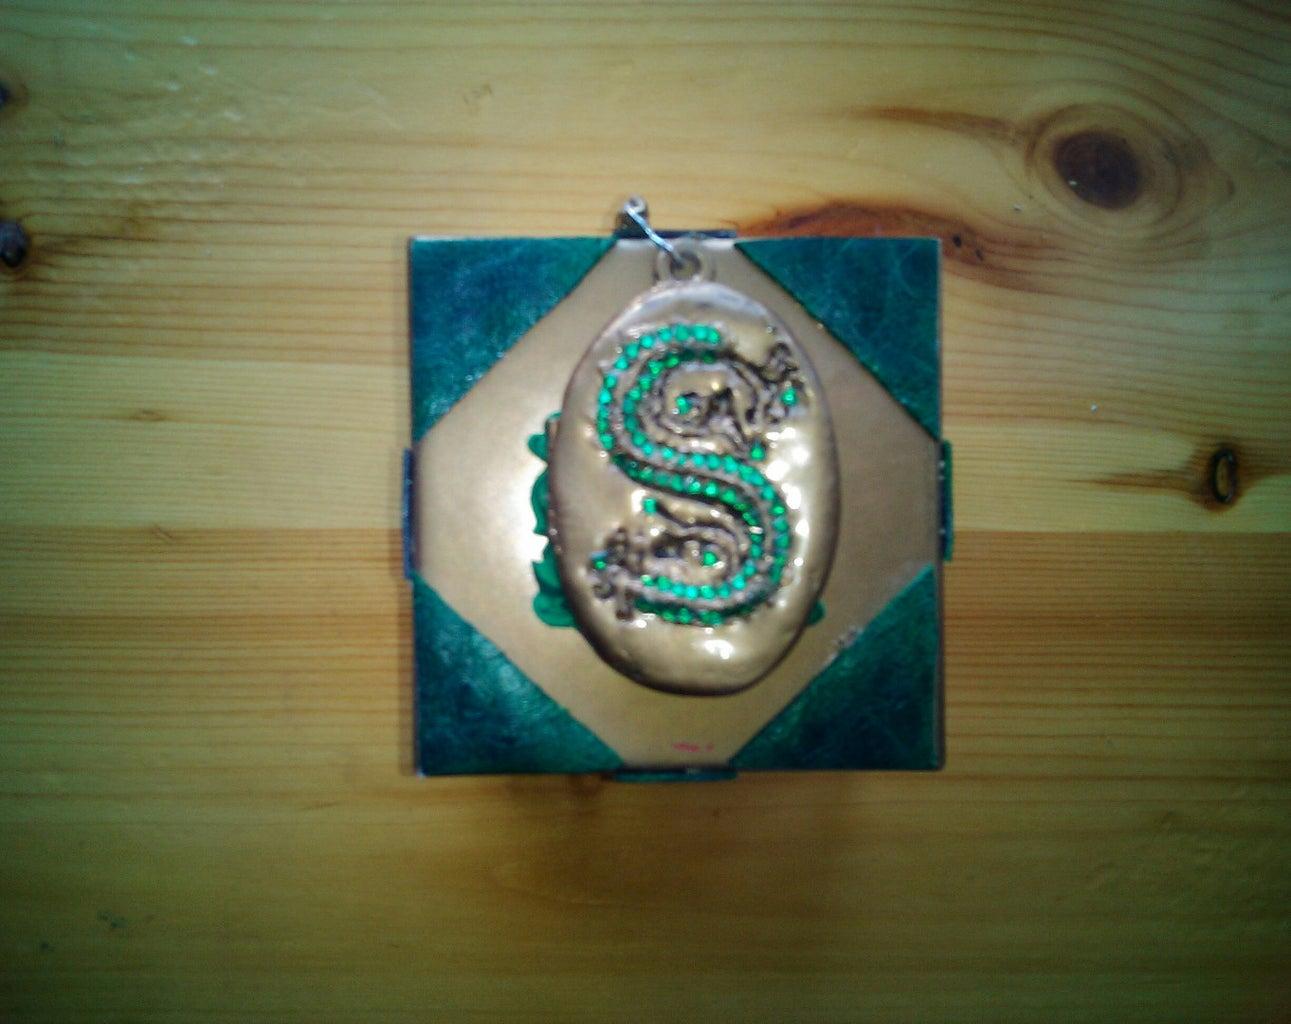 The Slytherin's Locket